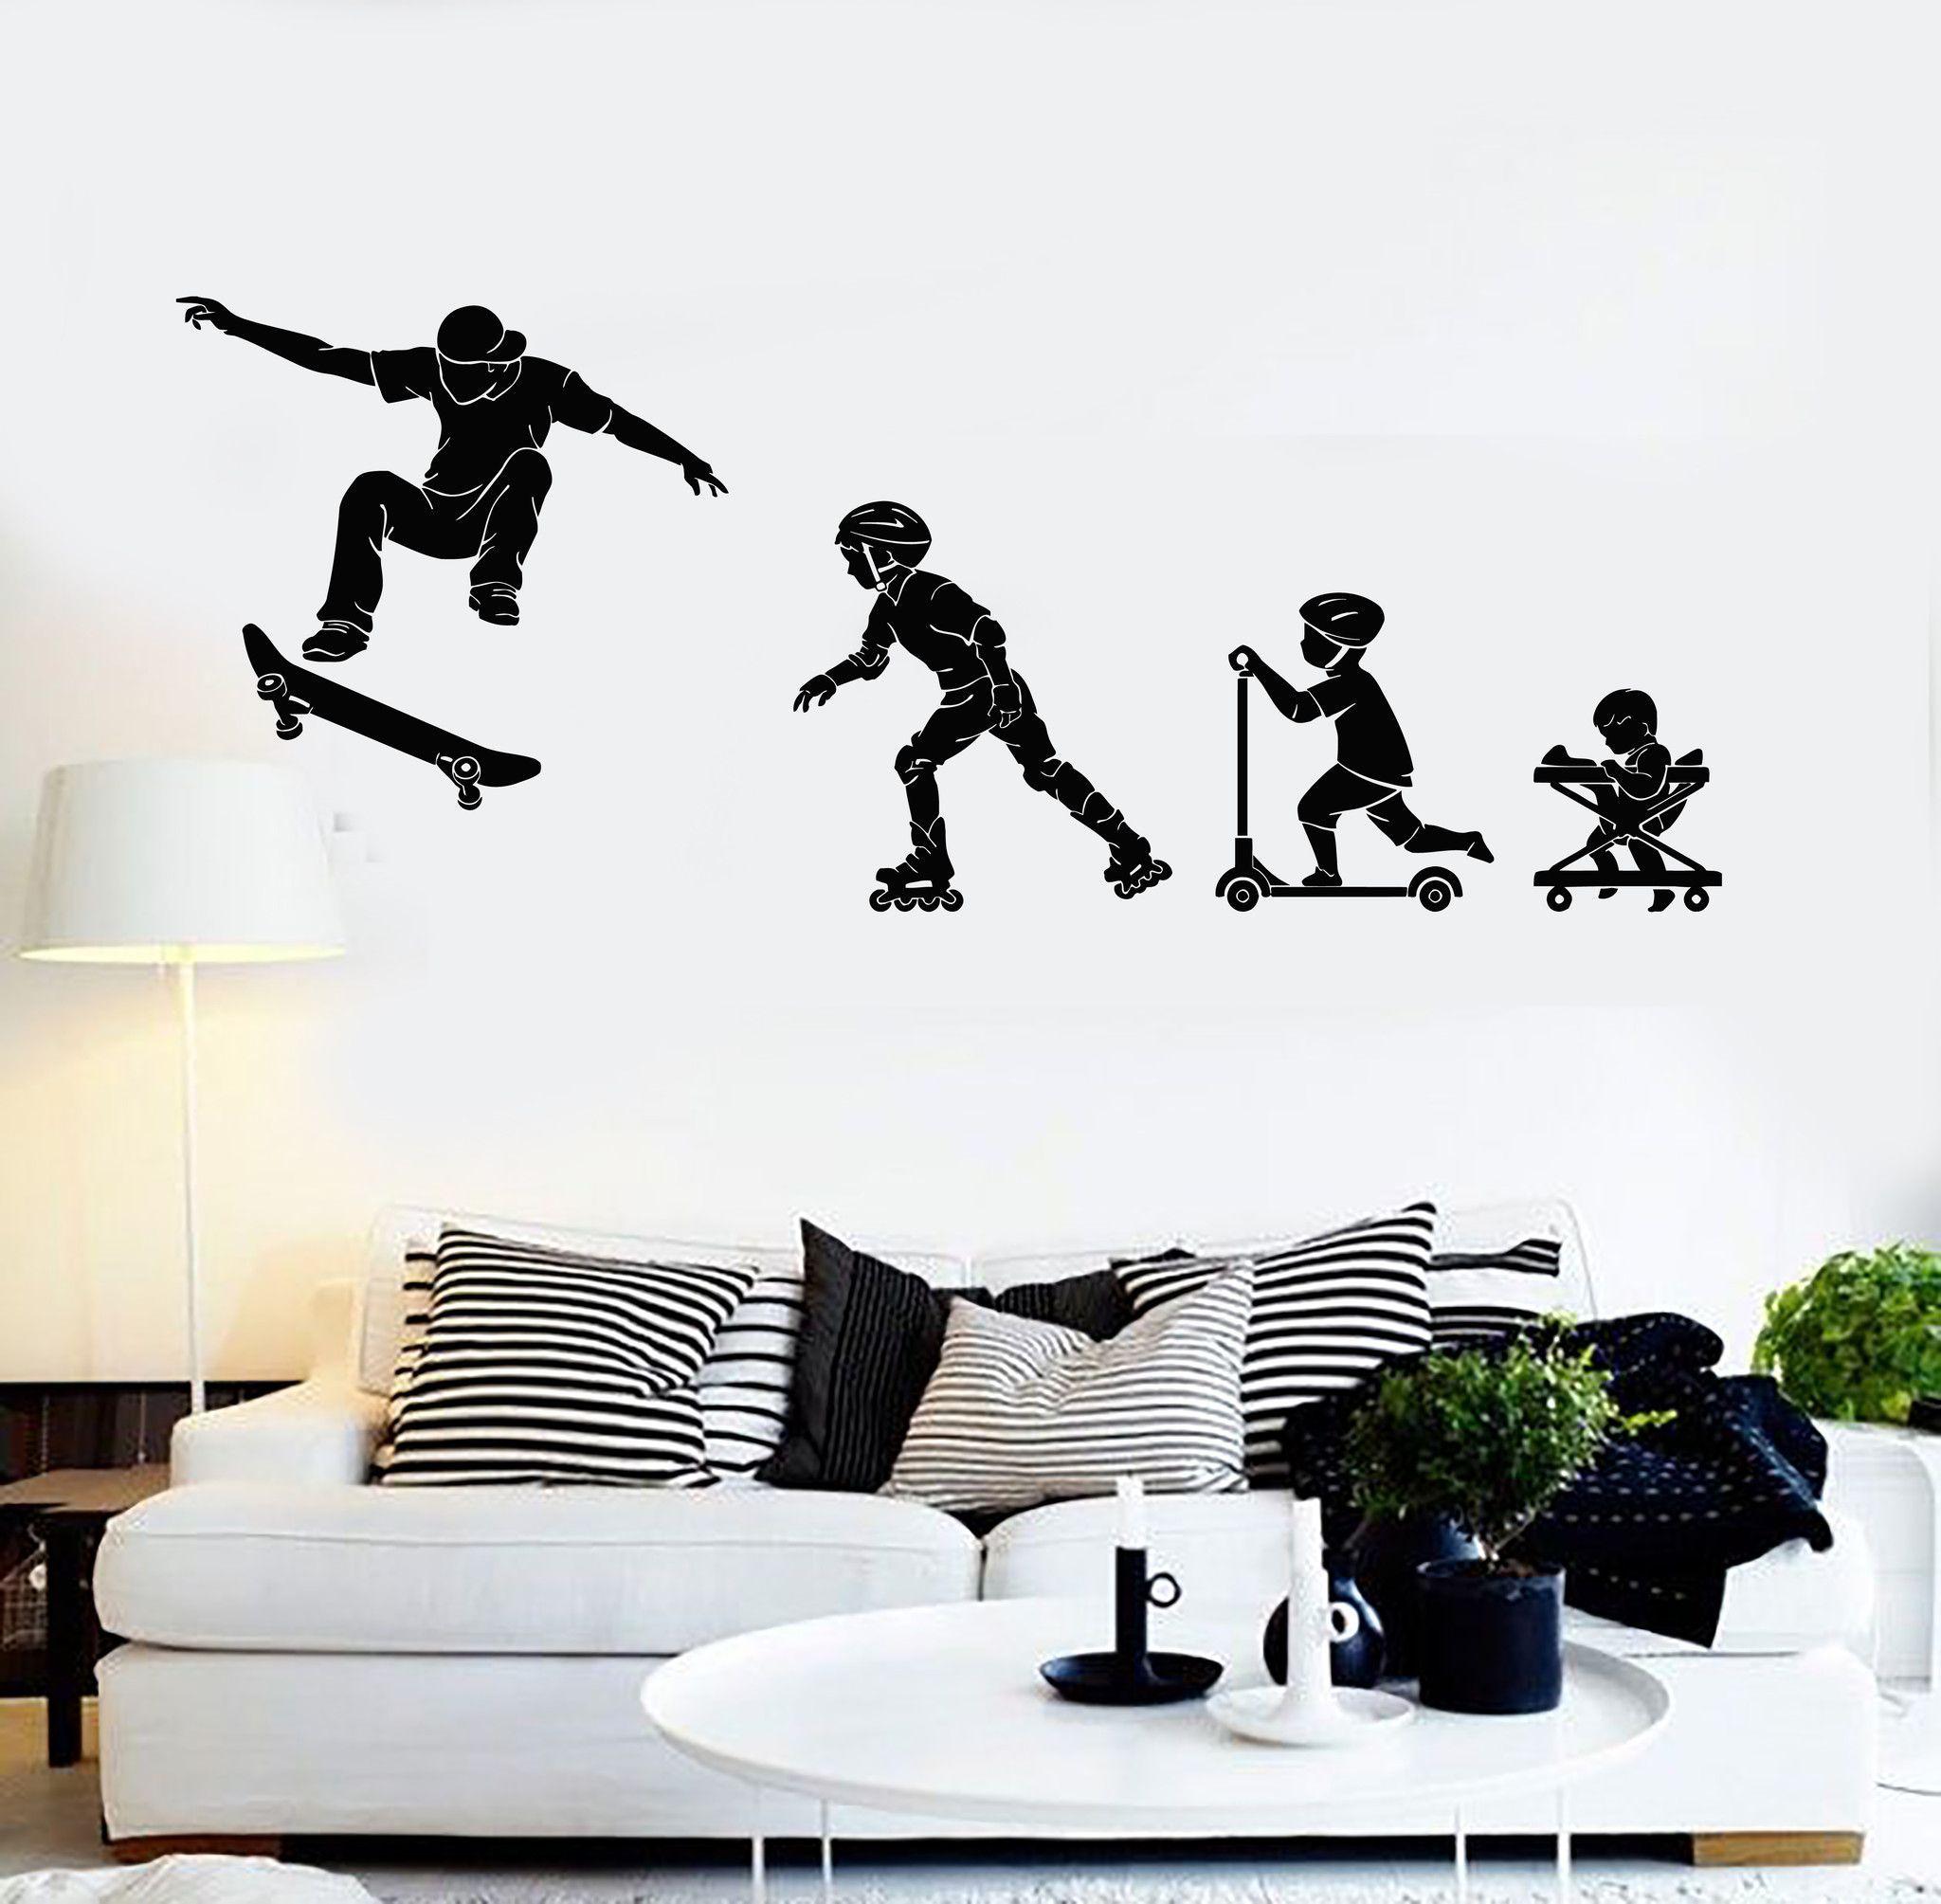 Big Wall Art Decor Skateboarding Boys Wall Transfer Boys Wall Sticker ne37